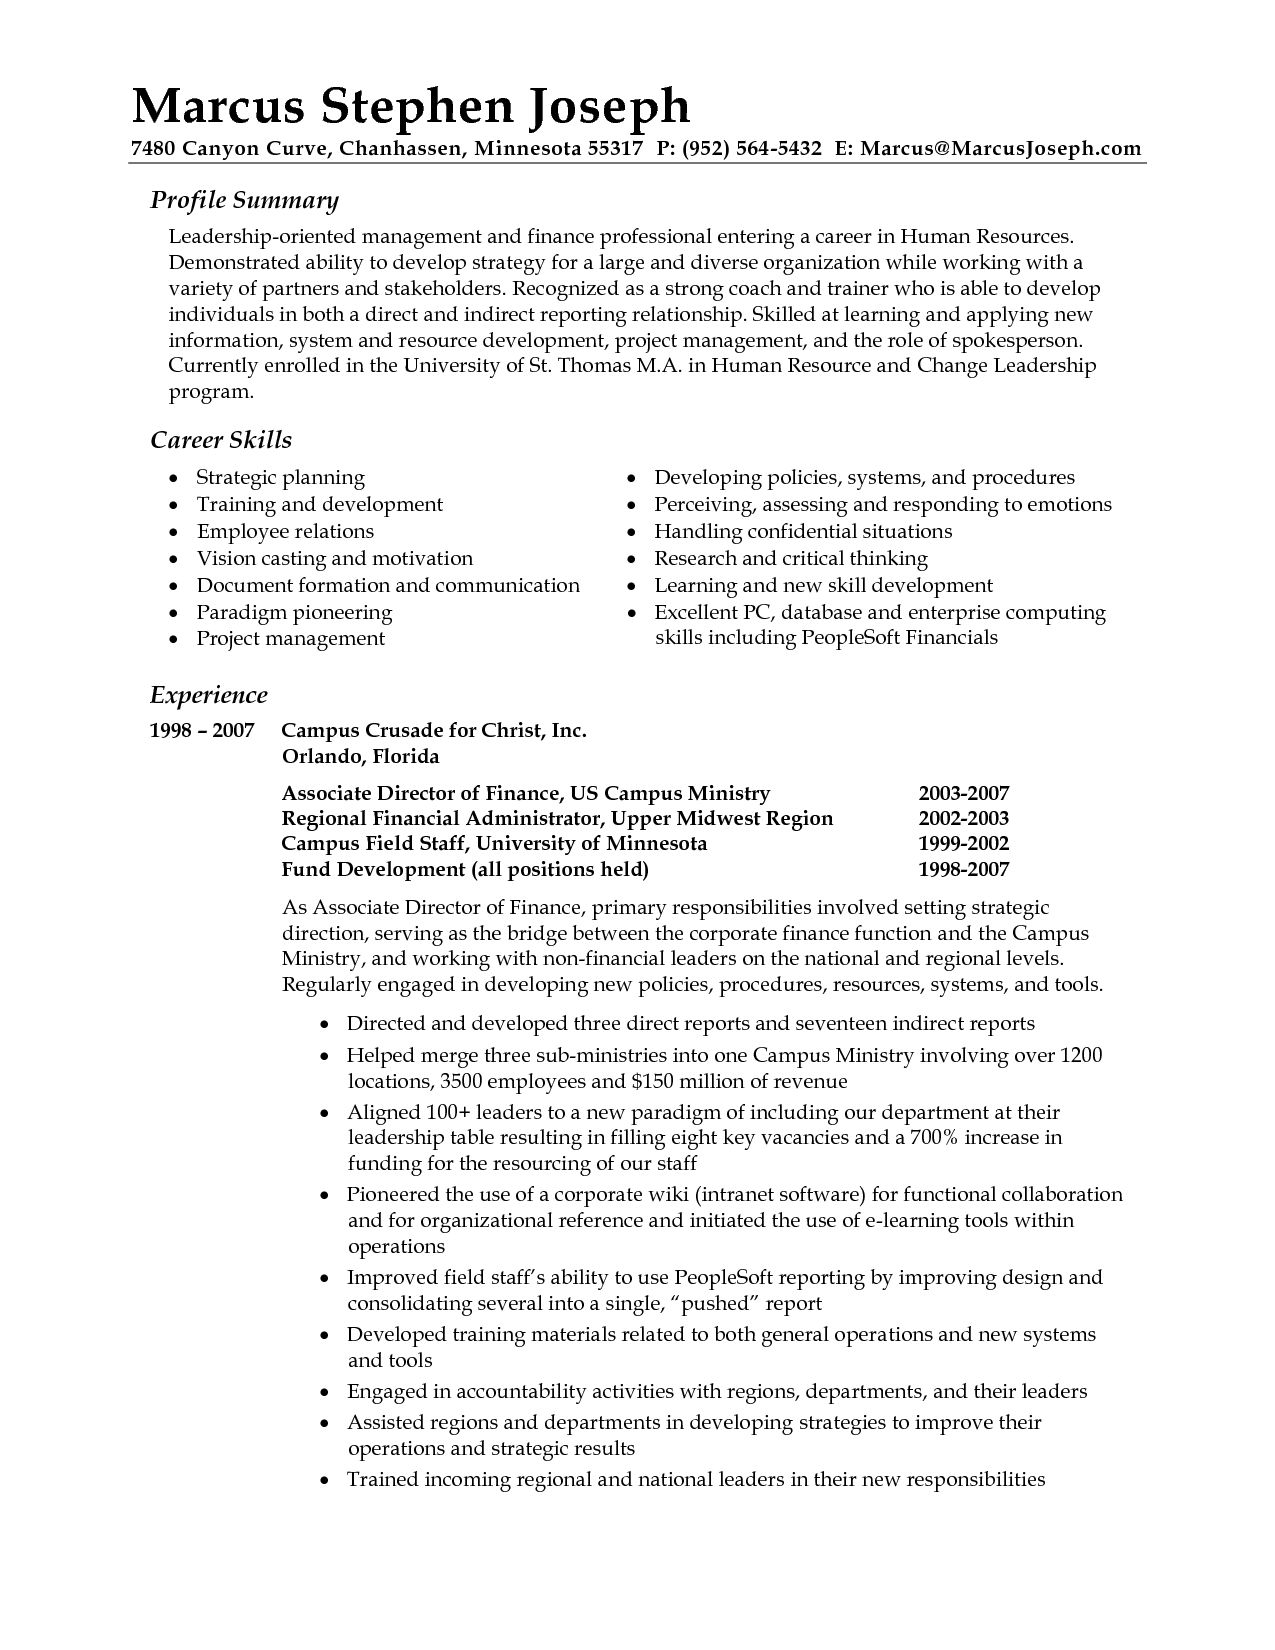 Professional Summary Resume Examples Career Summary Resume